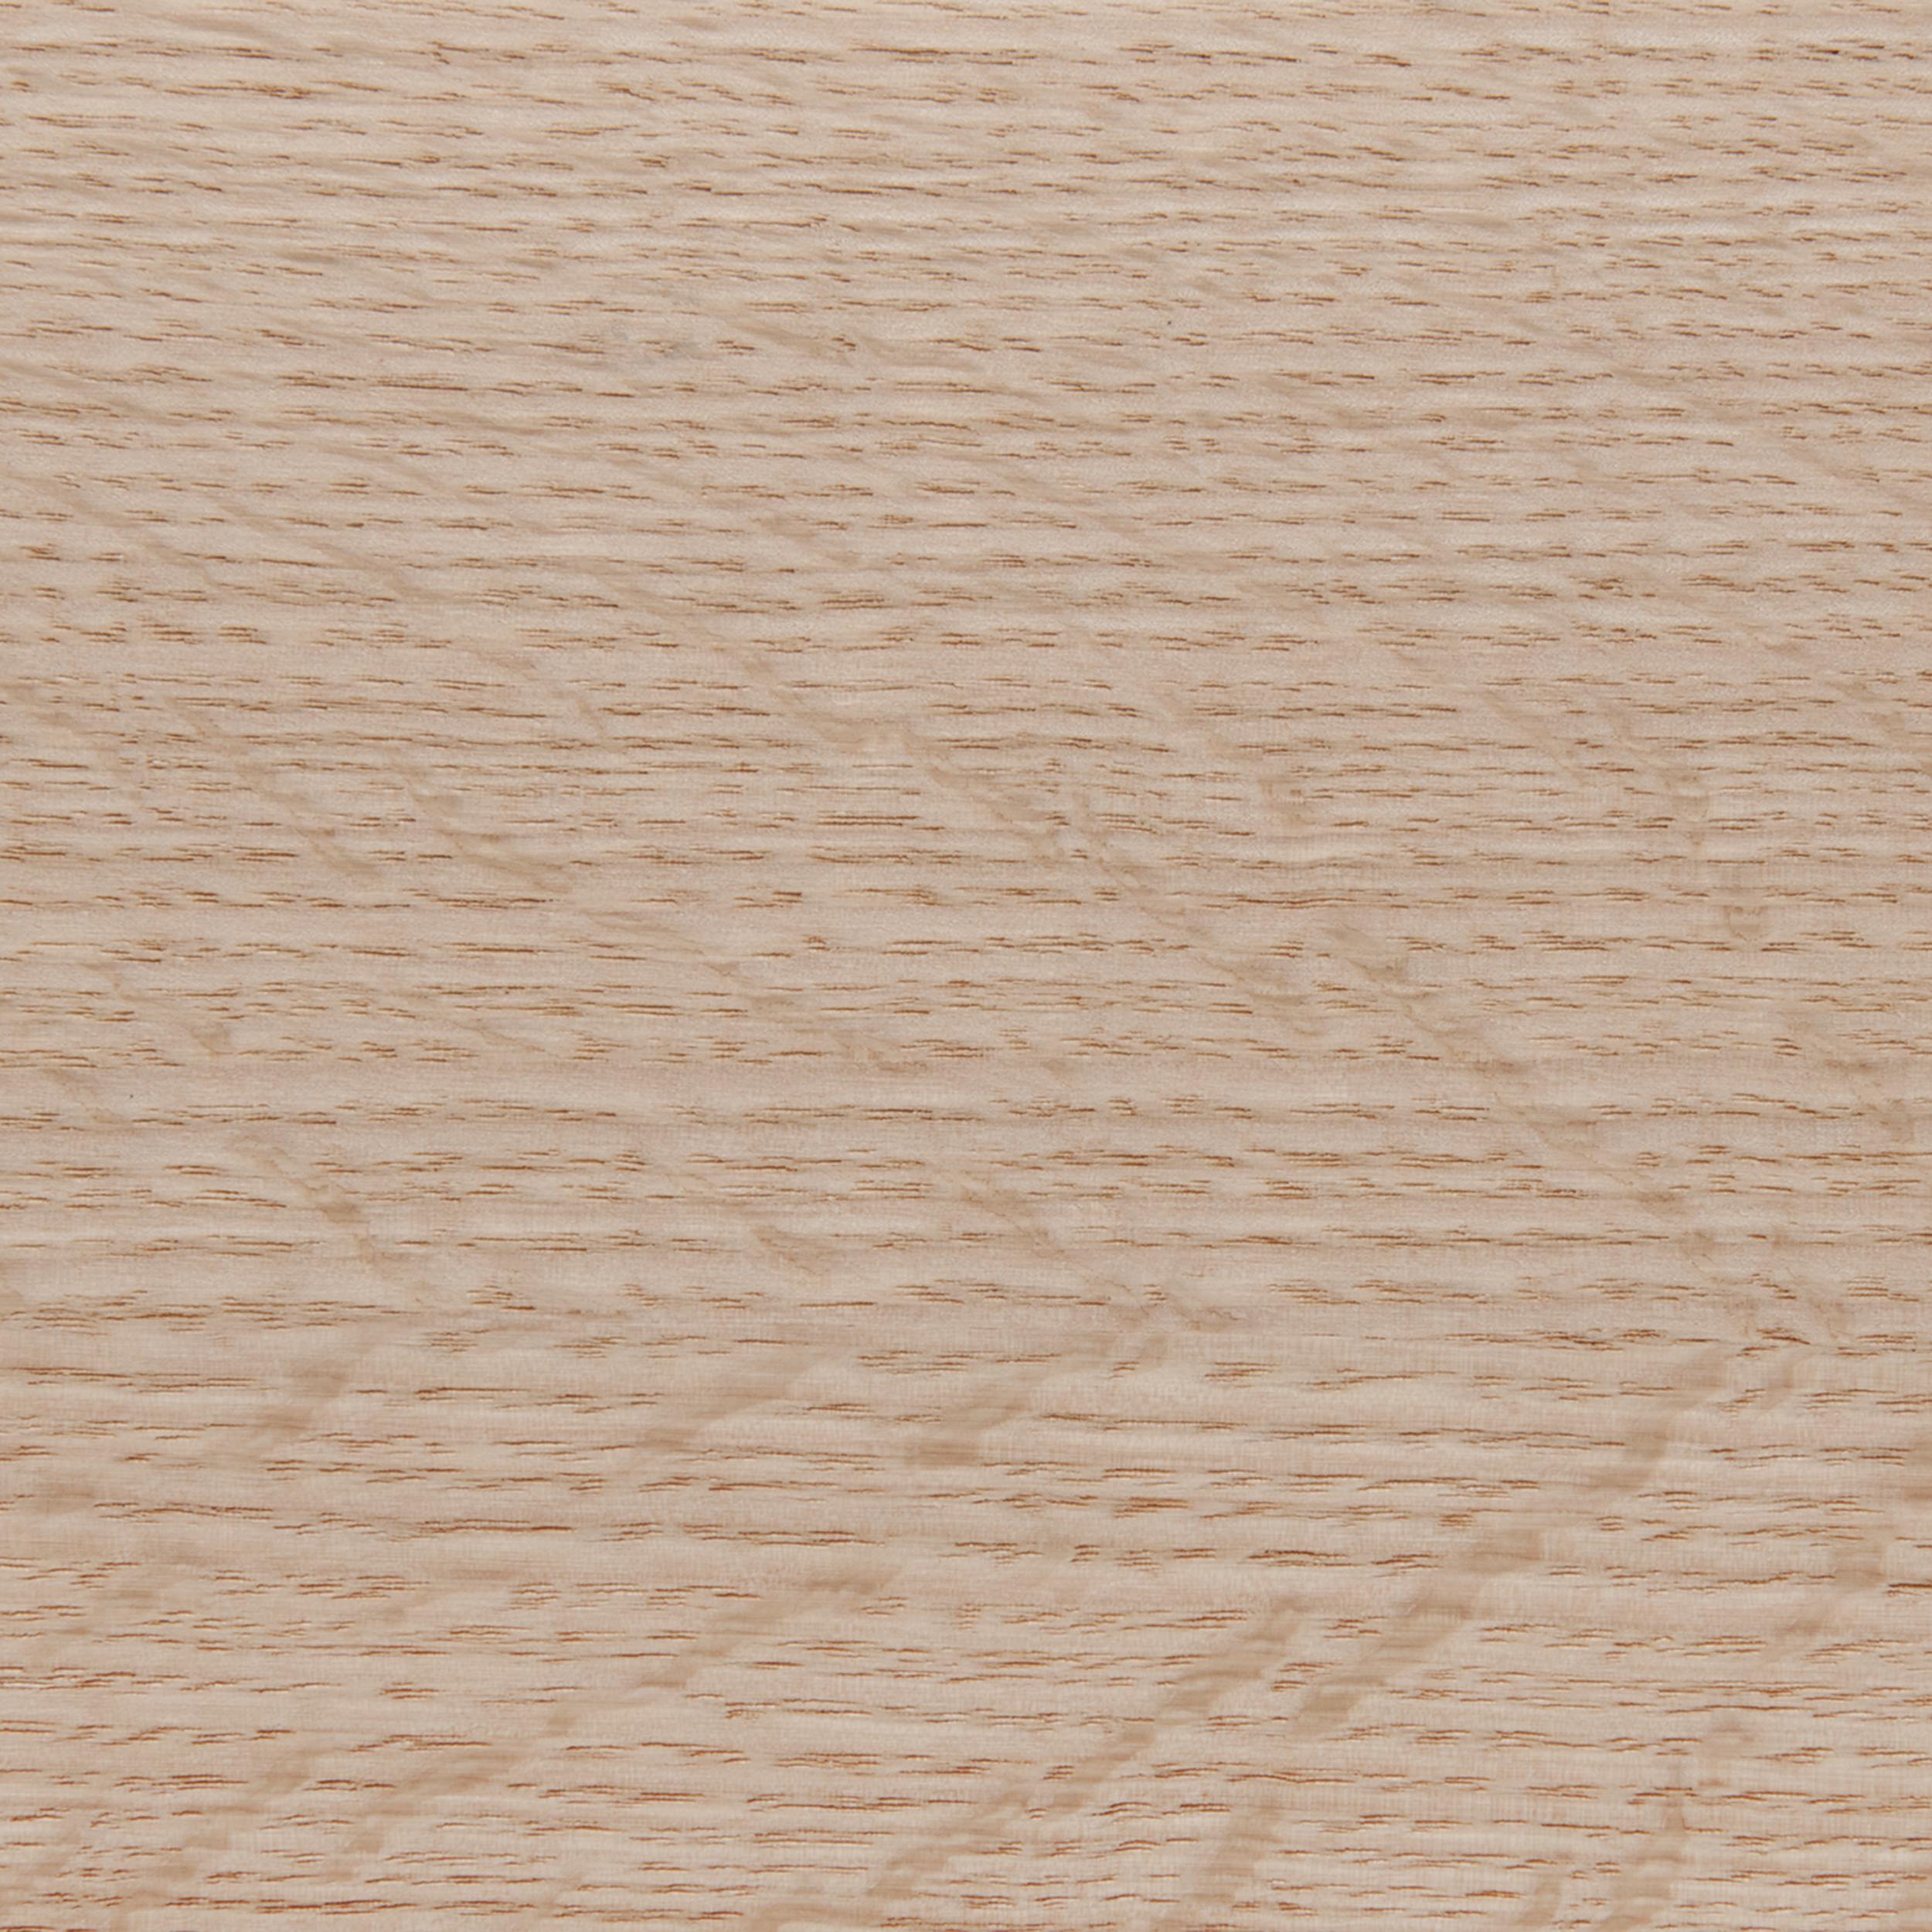 Quarter Sawn Flaky White Oak Veneer Sheet